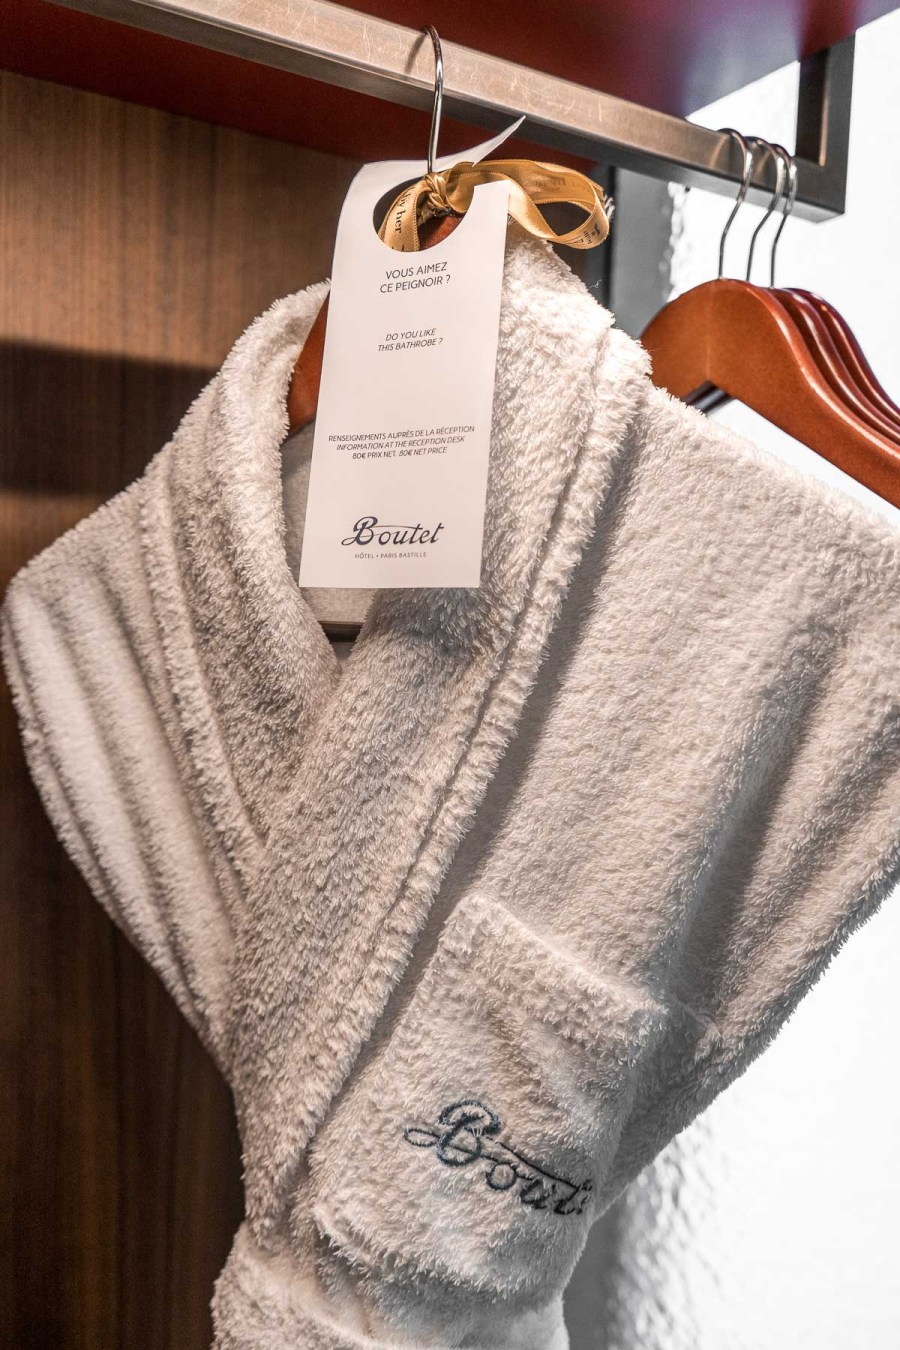 Bathroom in Hotel Paris Bastille Boutet